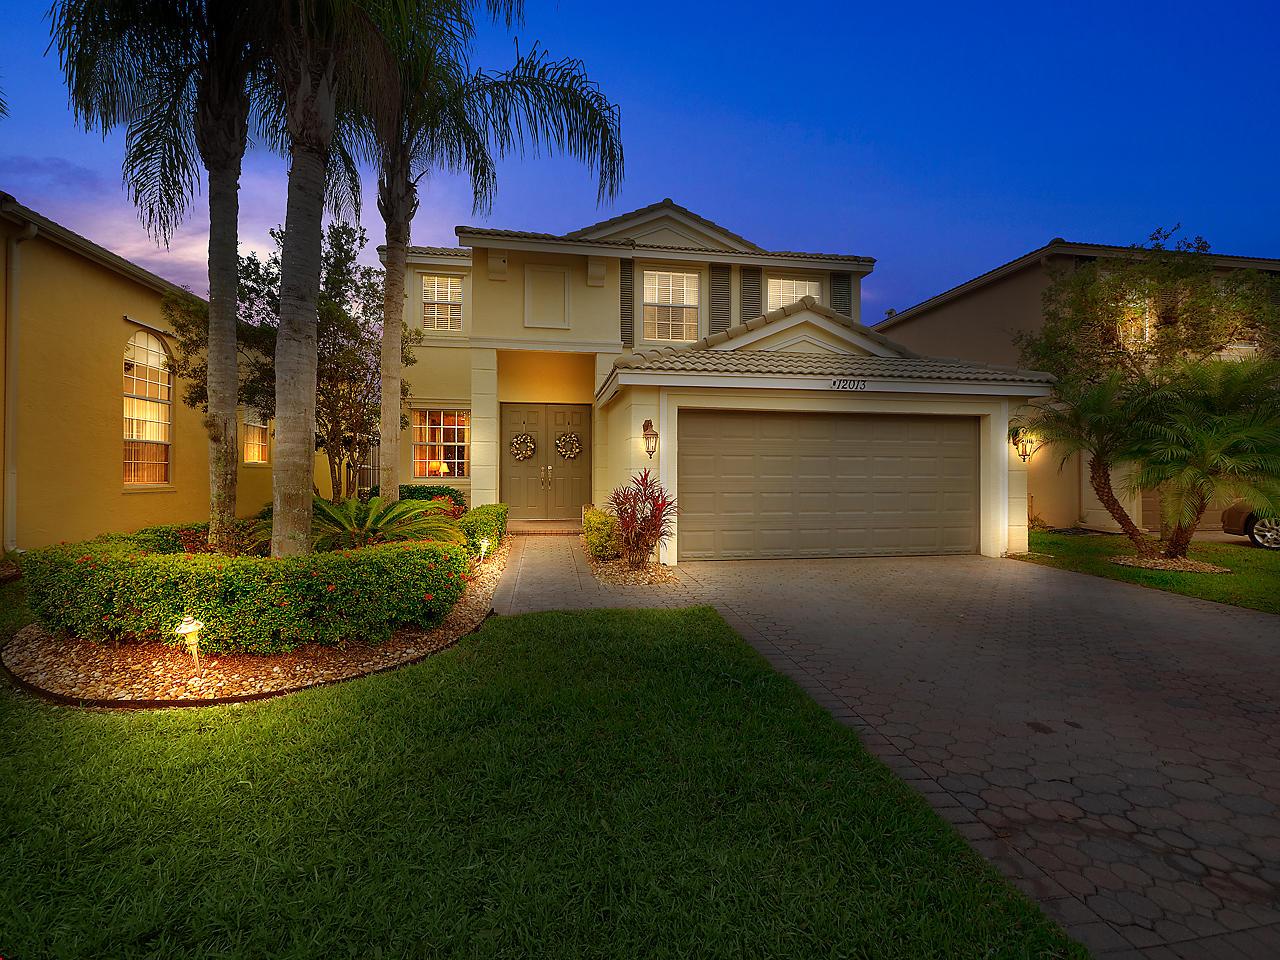 12013 Bennington Circle, Port Saint Lucie, Florida 34987, 4 Bedrooms Bedrooms, ,2.1 BathroomsBathrooms,A,Single family,Bennington,RX-10613207